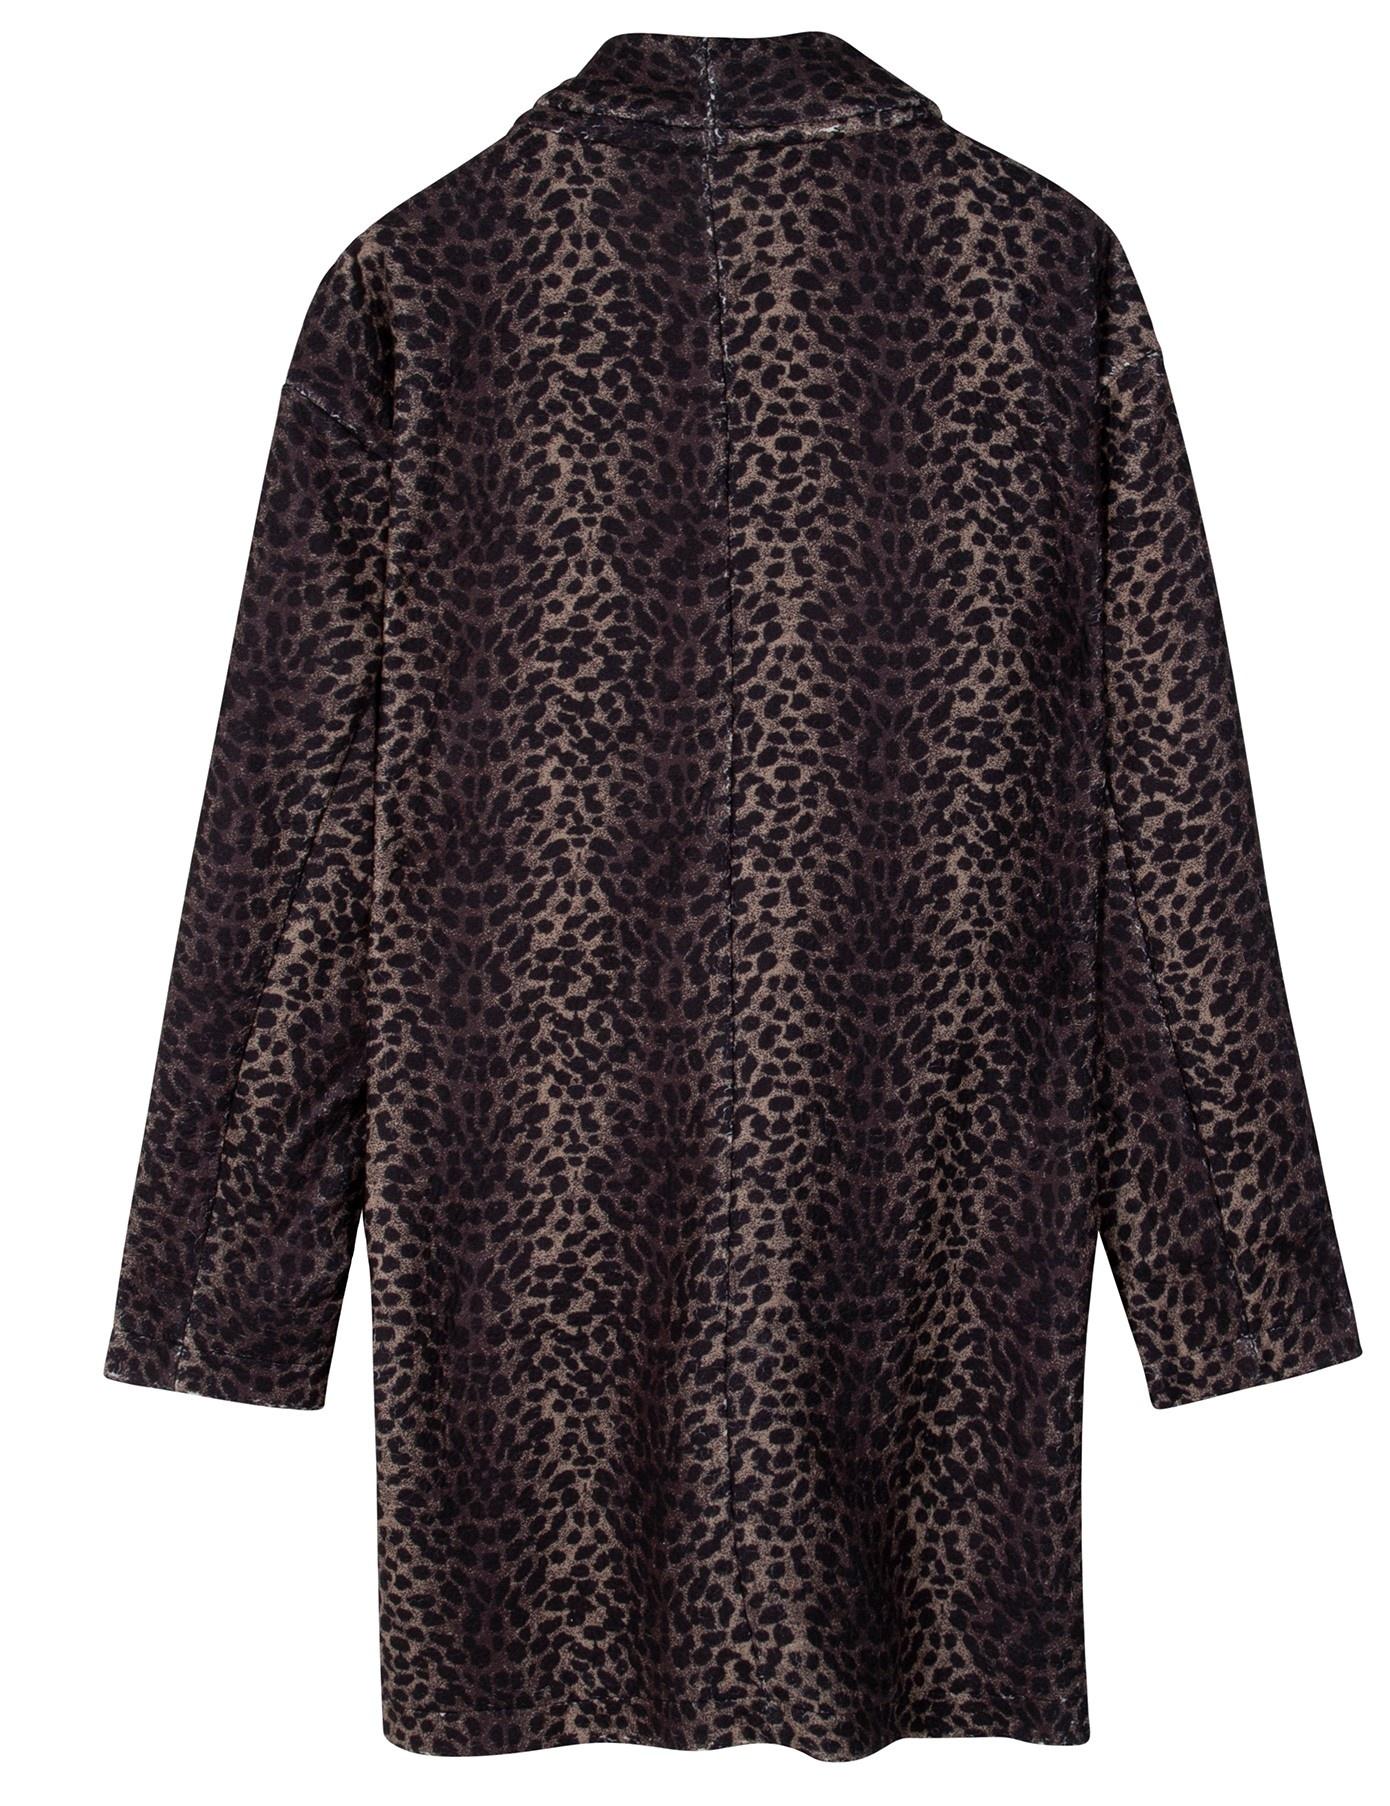 Jas coat leopard camo desert taupe-4